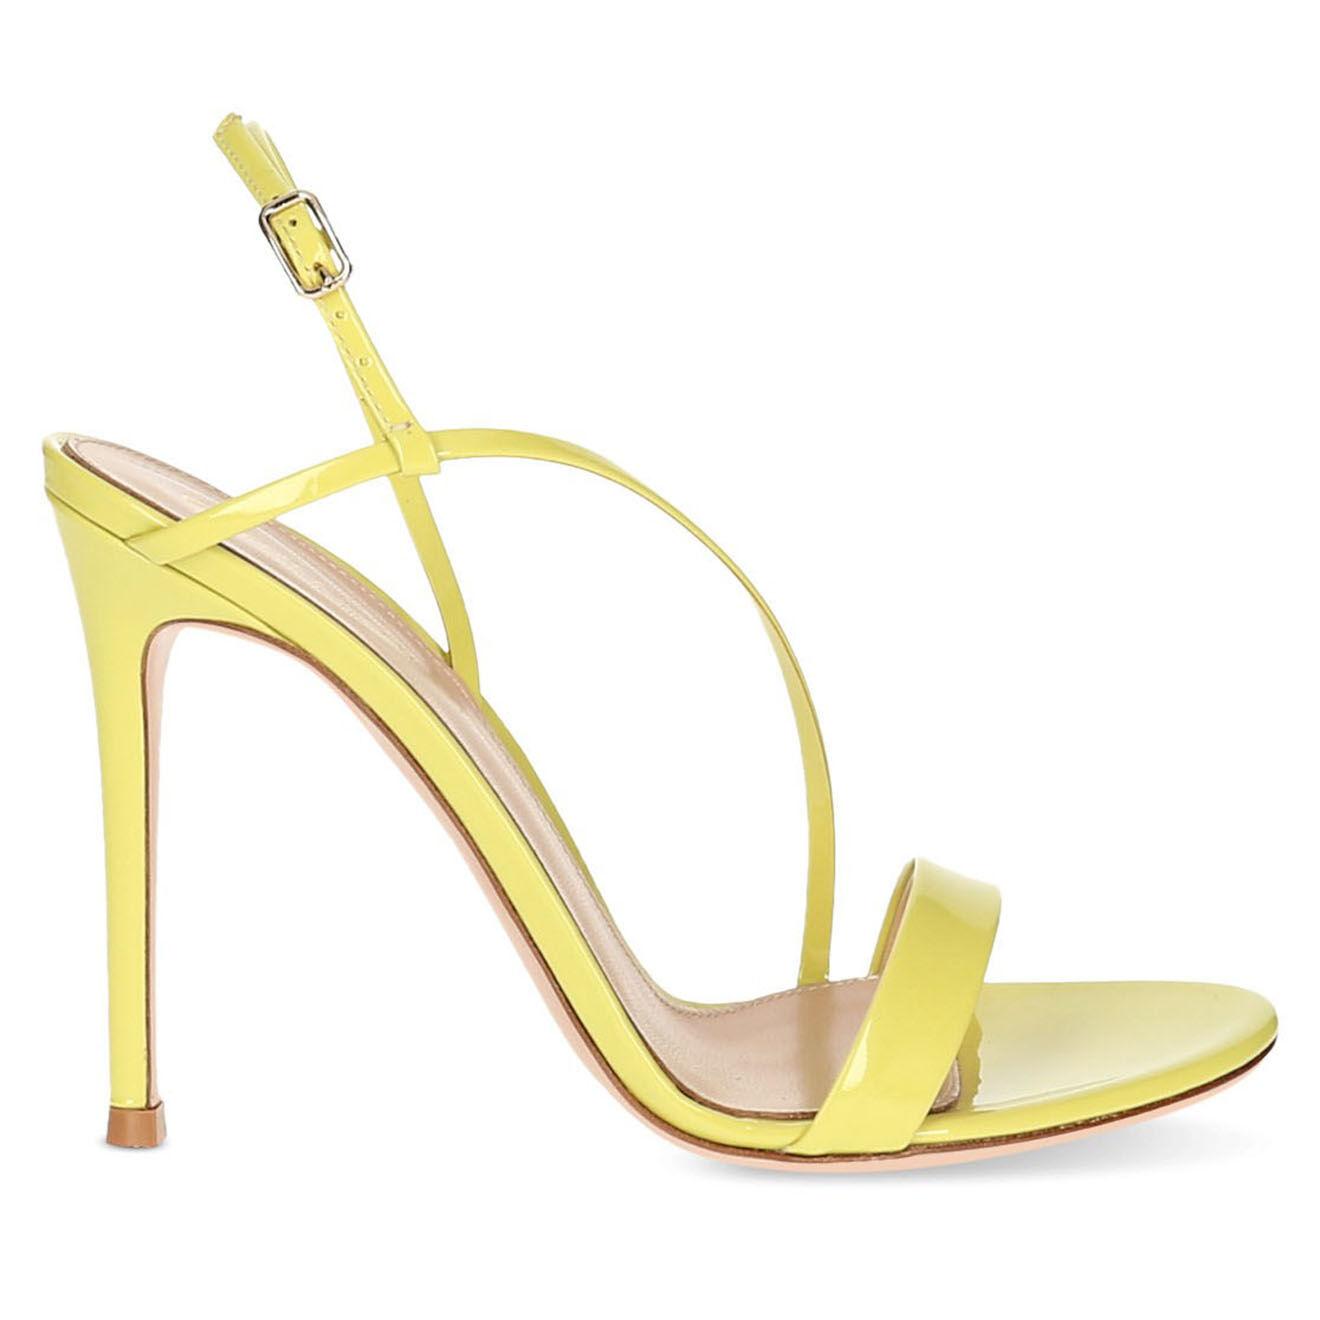 Sandales en Cuir verni - Talon 11 cm - Gianvito Rossi - Modalova